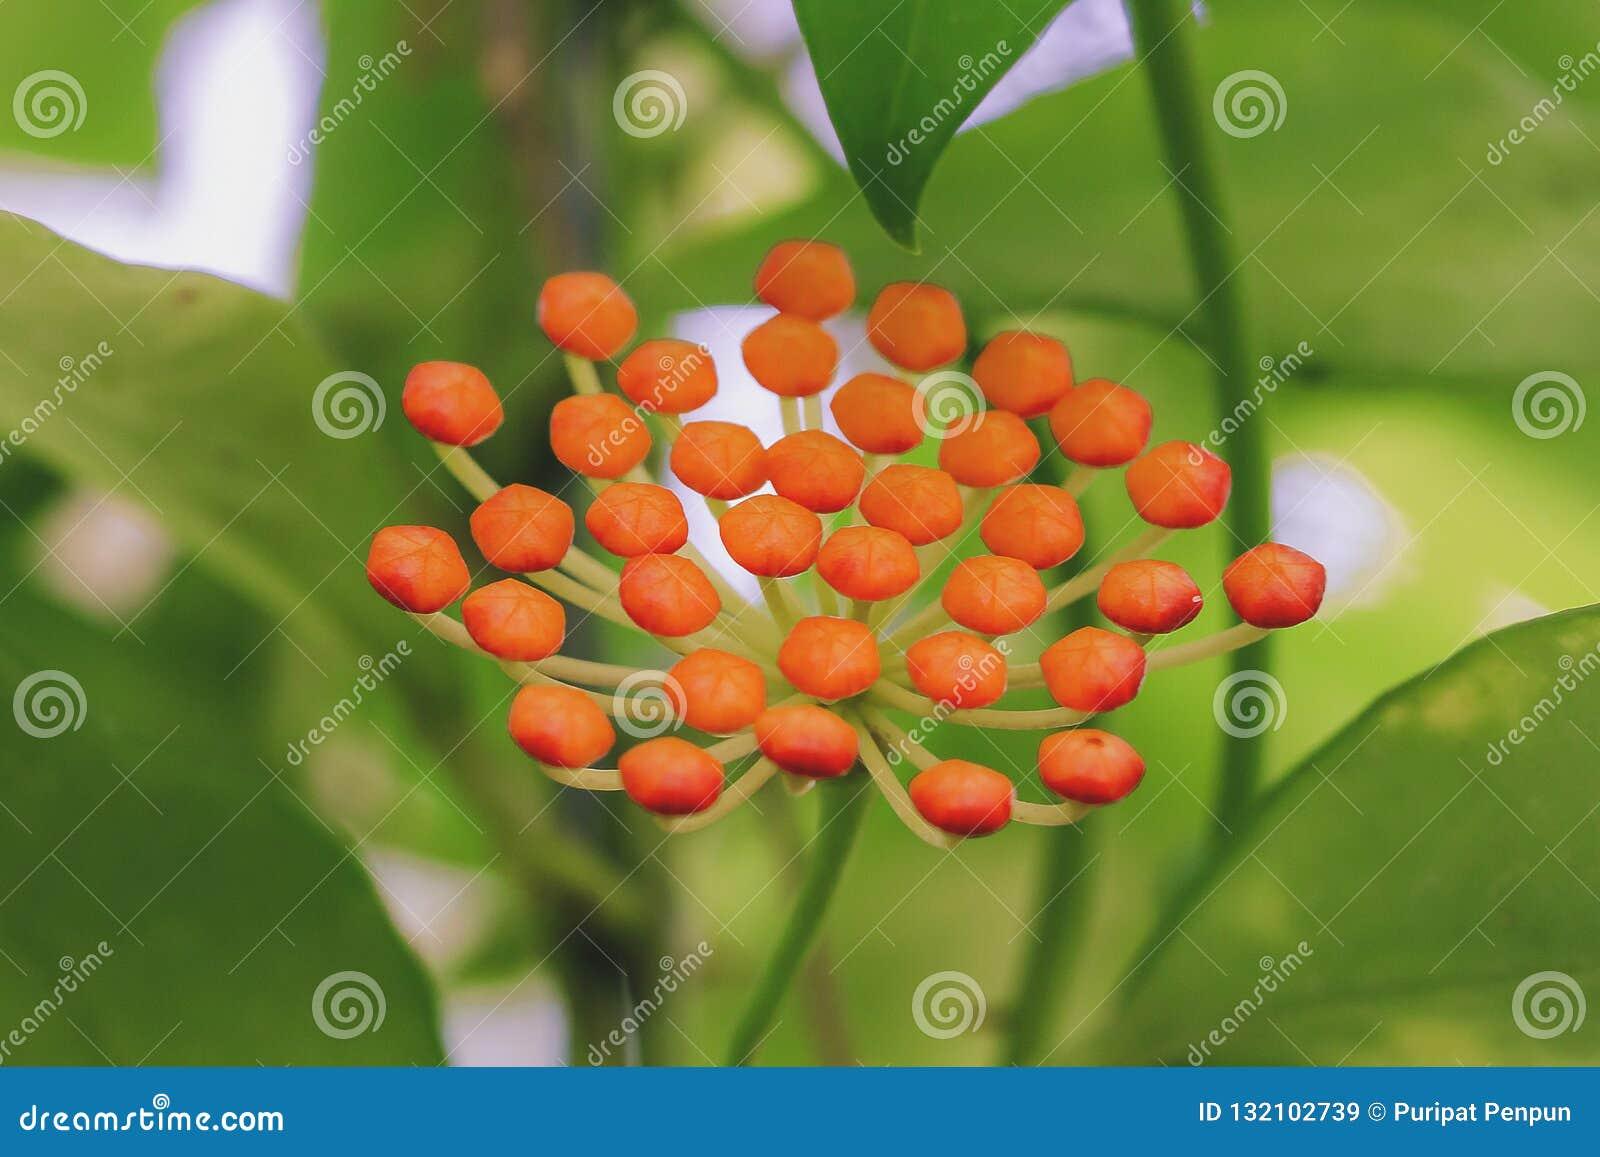 Hoya kerrii found in Thailand